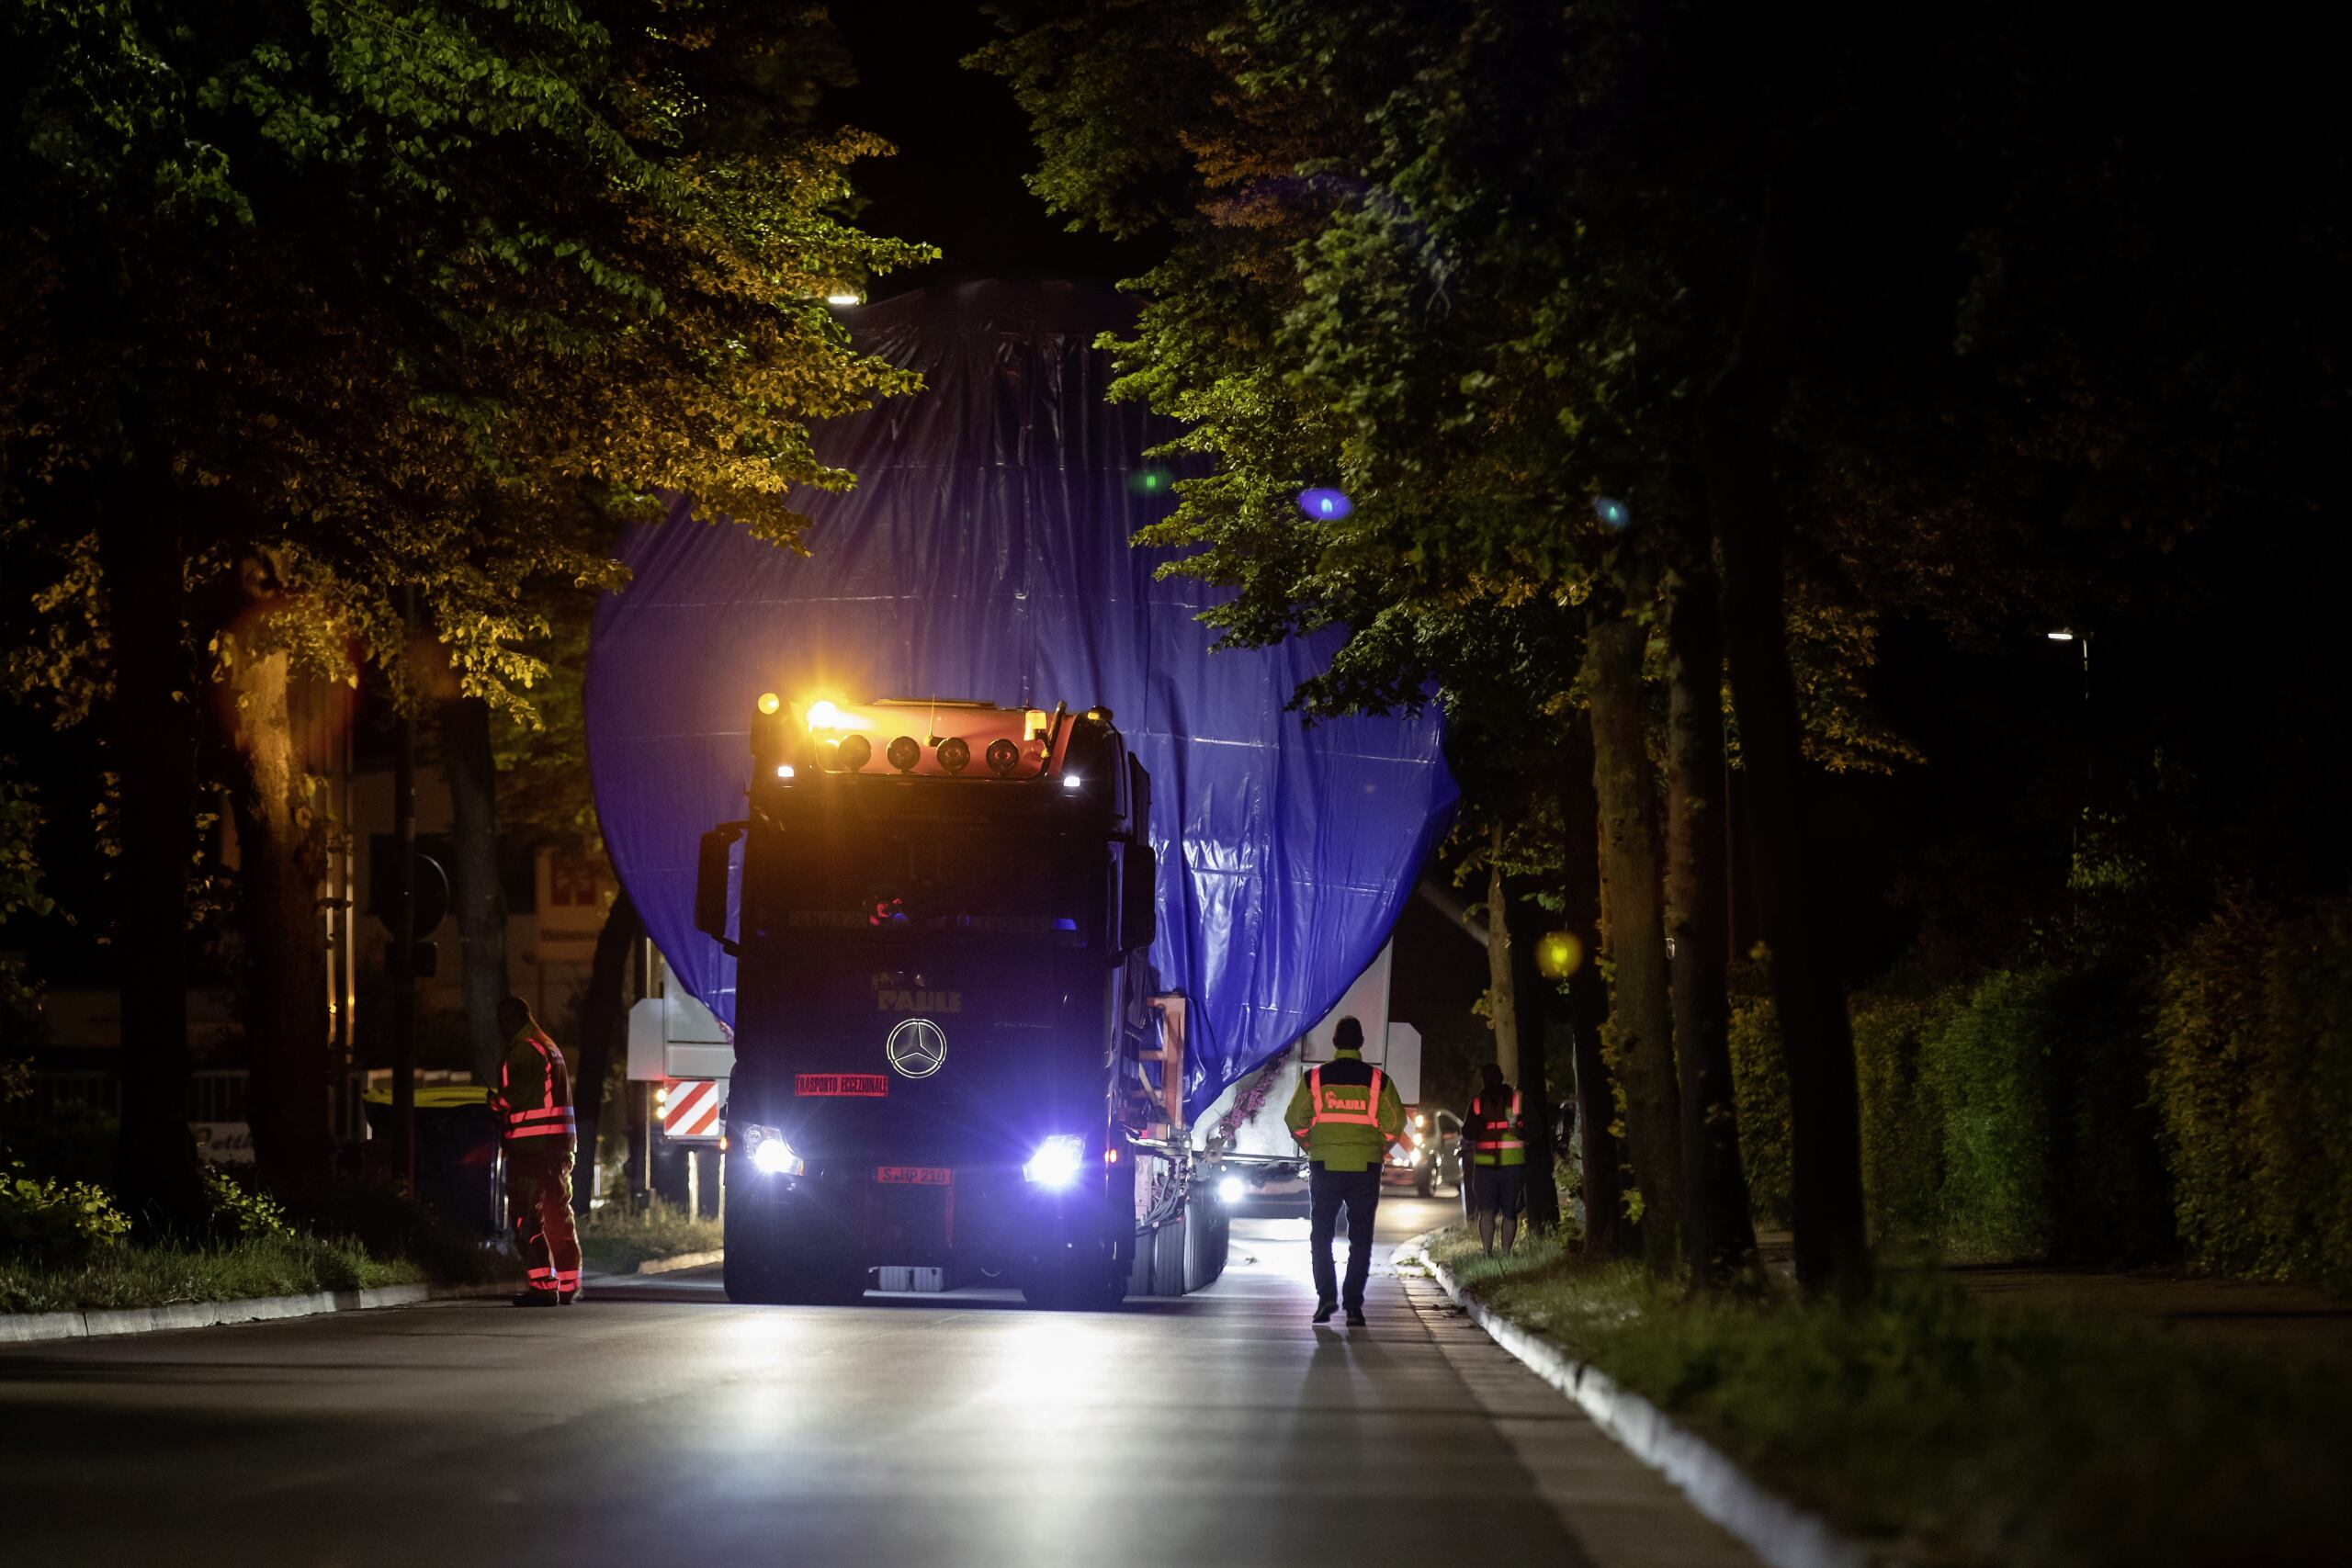 Mercedes Actros gigantesco serbatoio